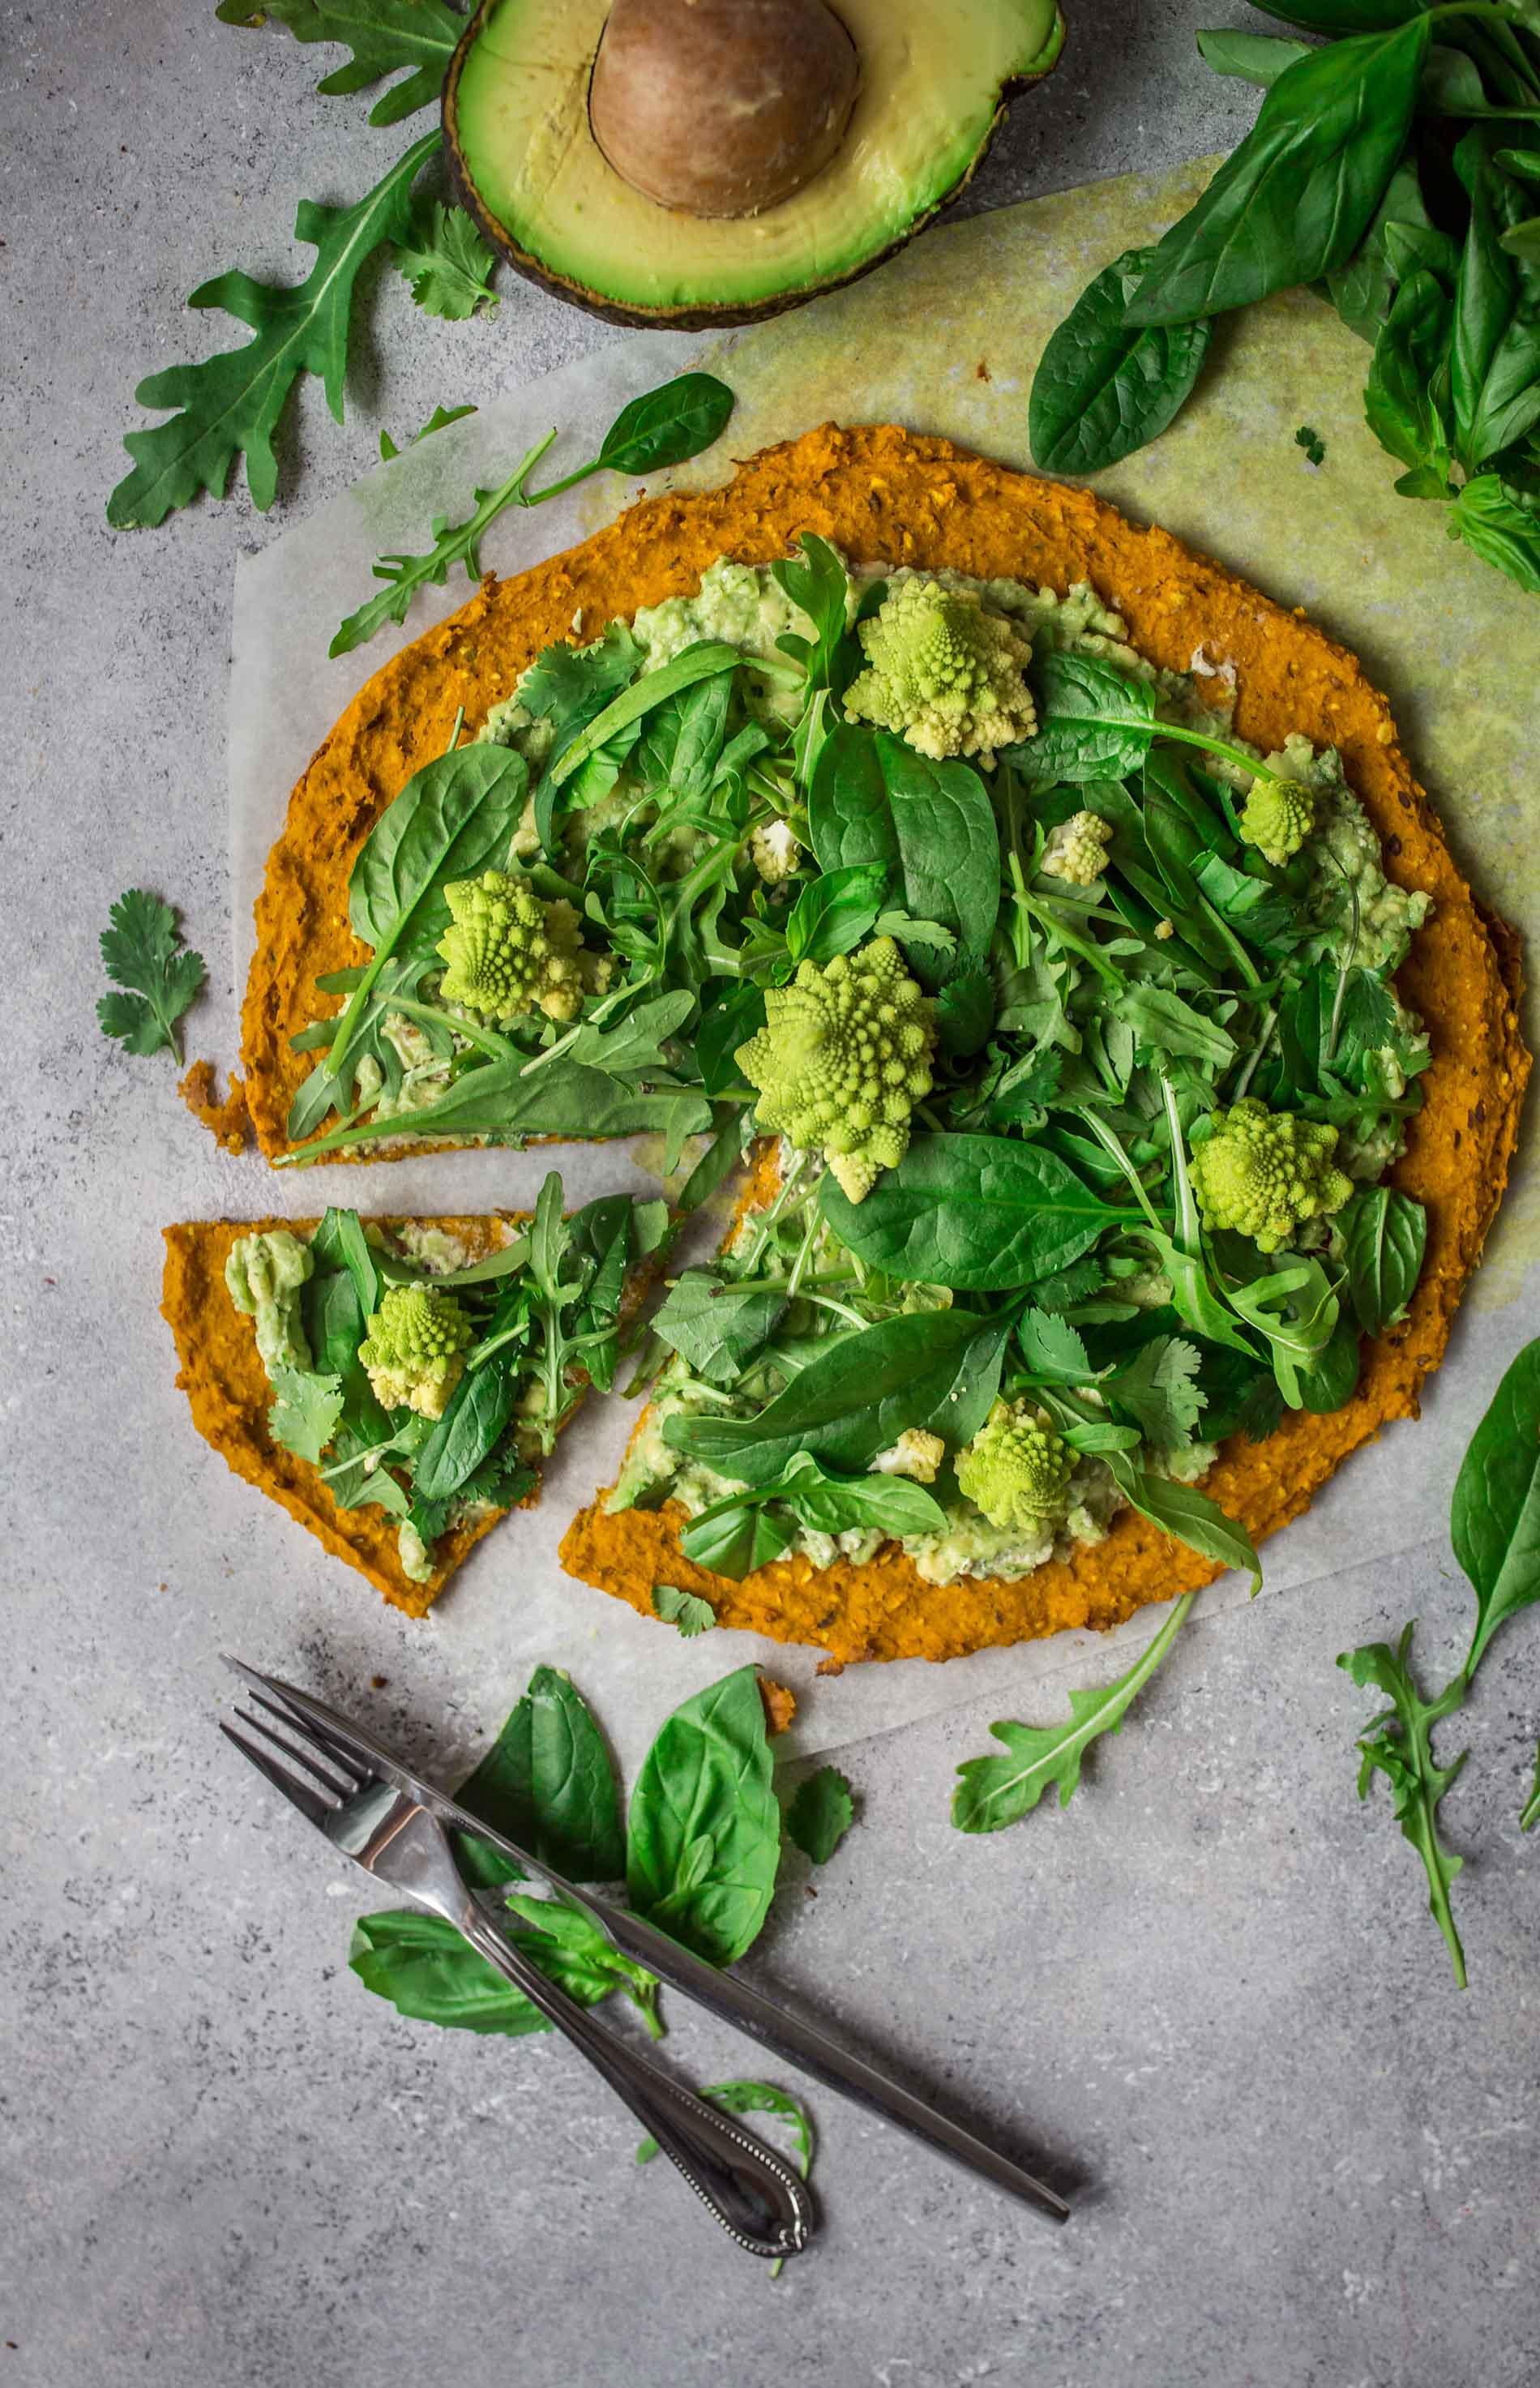 Vegane Süsskartoffel Pizza mit Guacamole Belag